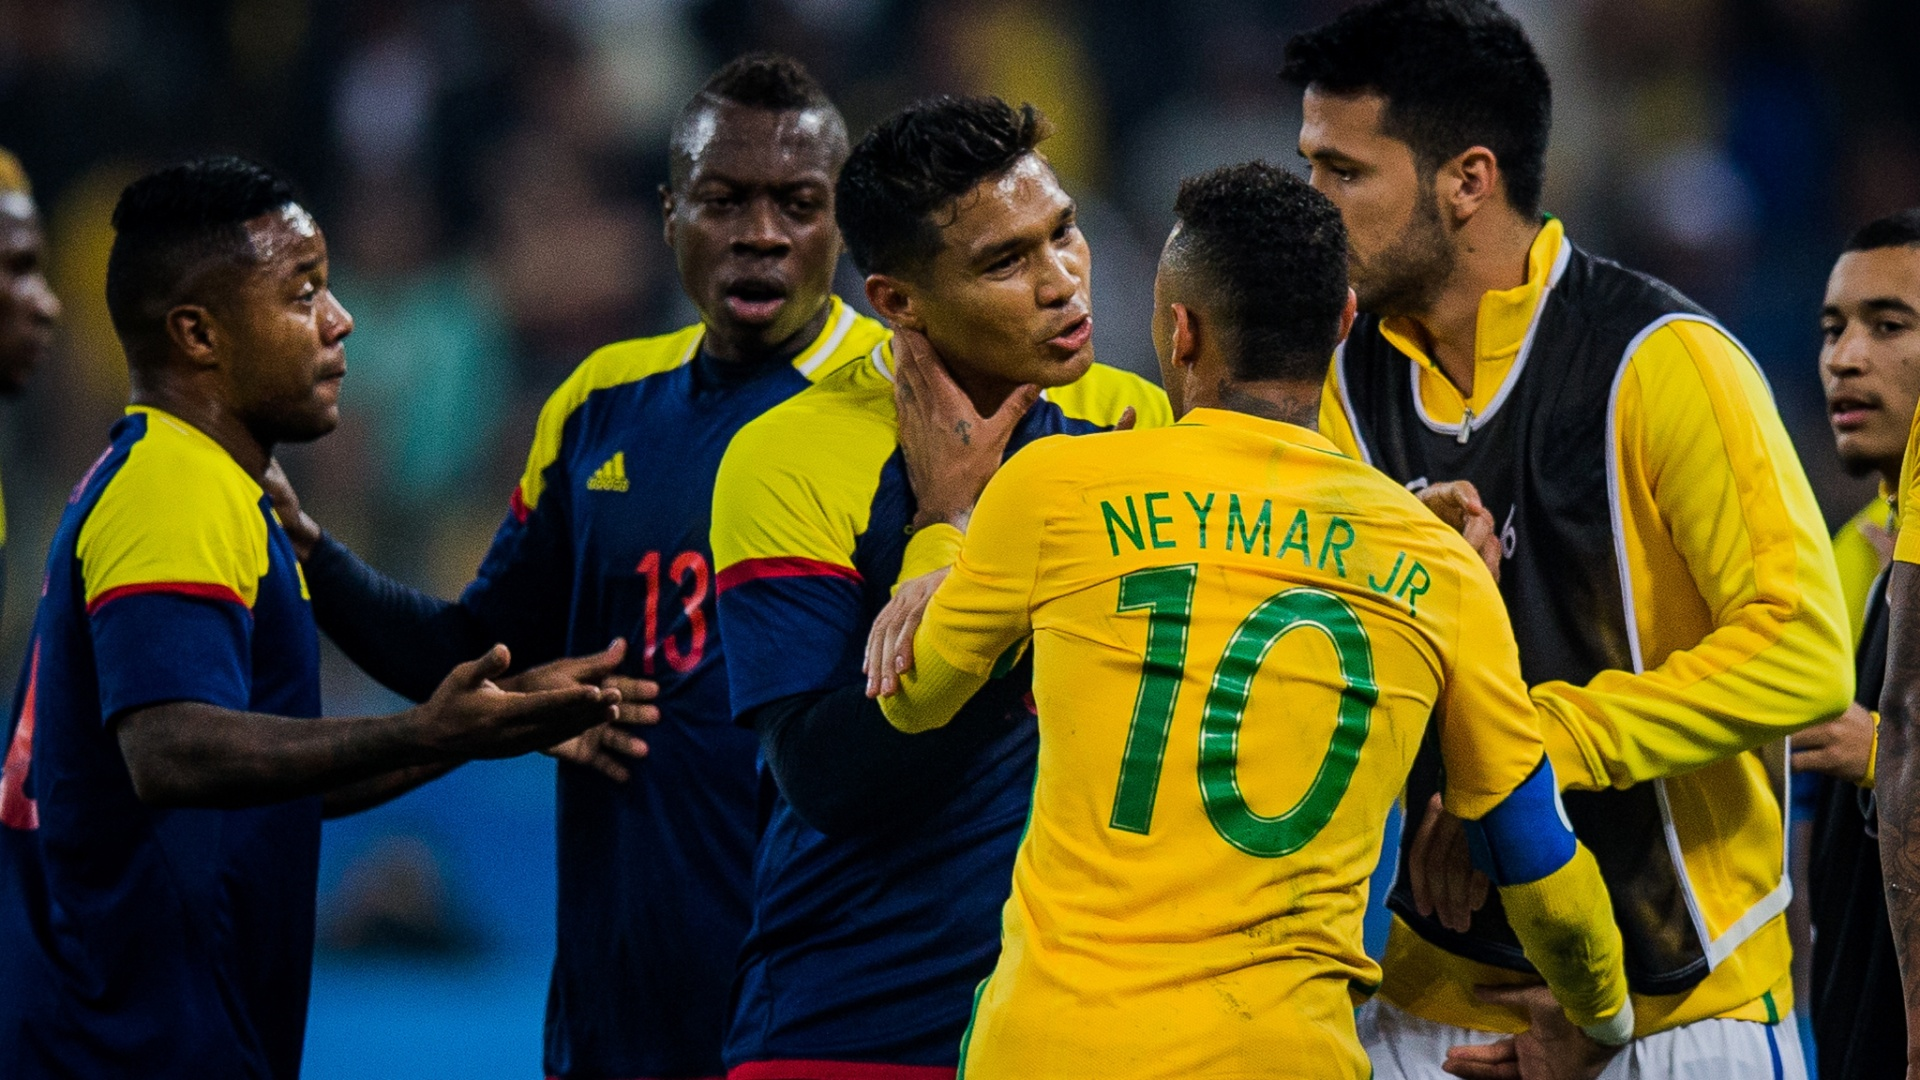 Após cometer falta, Neymar discute com Teo Gutiérrez